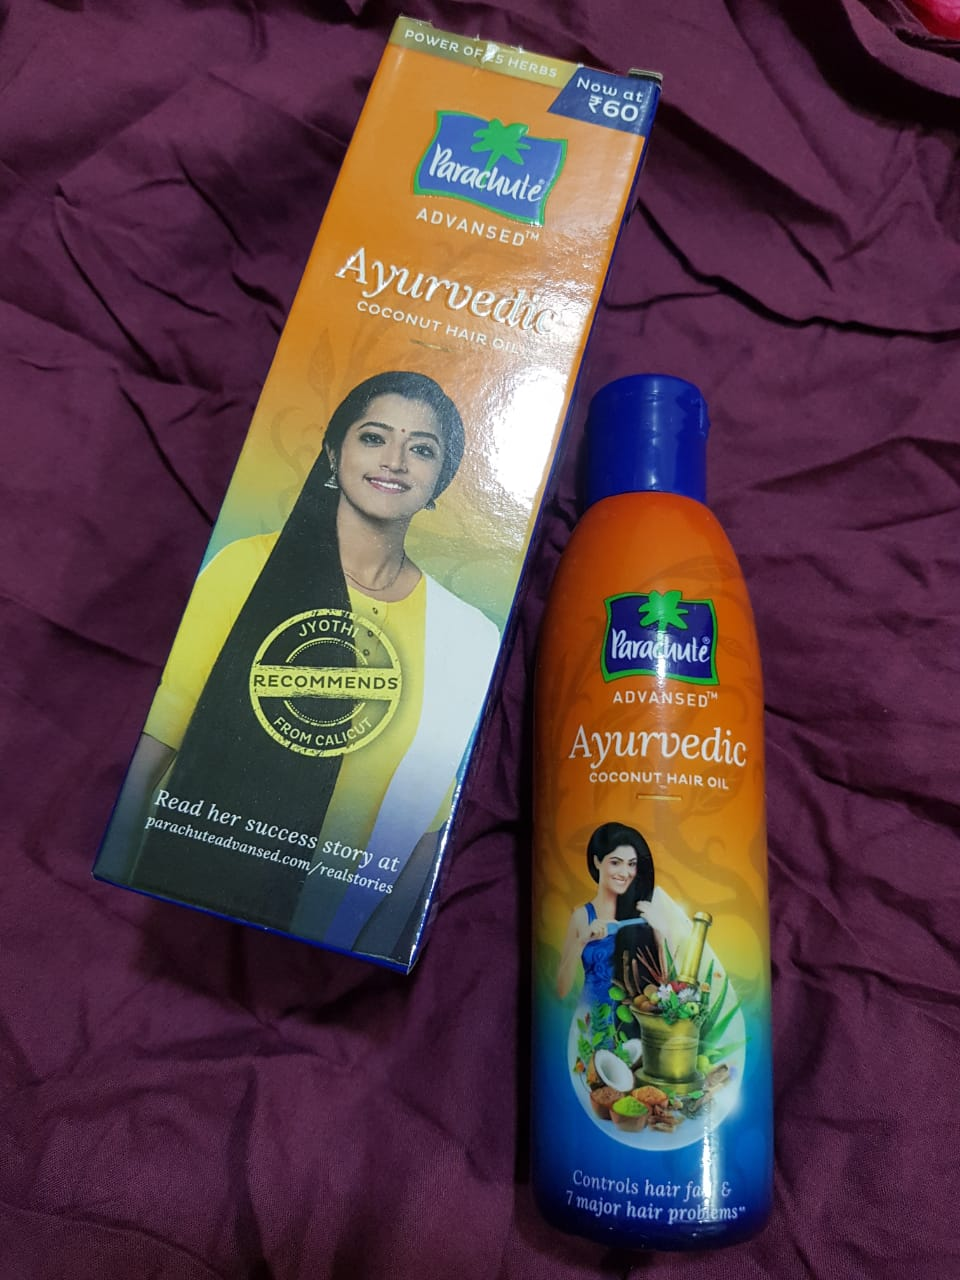 Parachute Advansed Ayurvedic Coconut Hair Oil -My Ayurvedic Oil-By smita_shukla